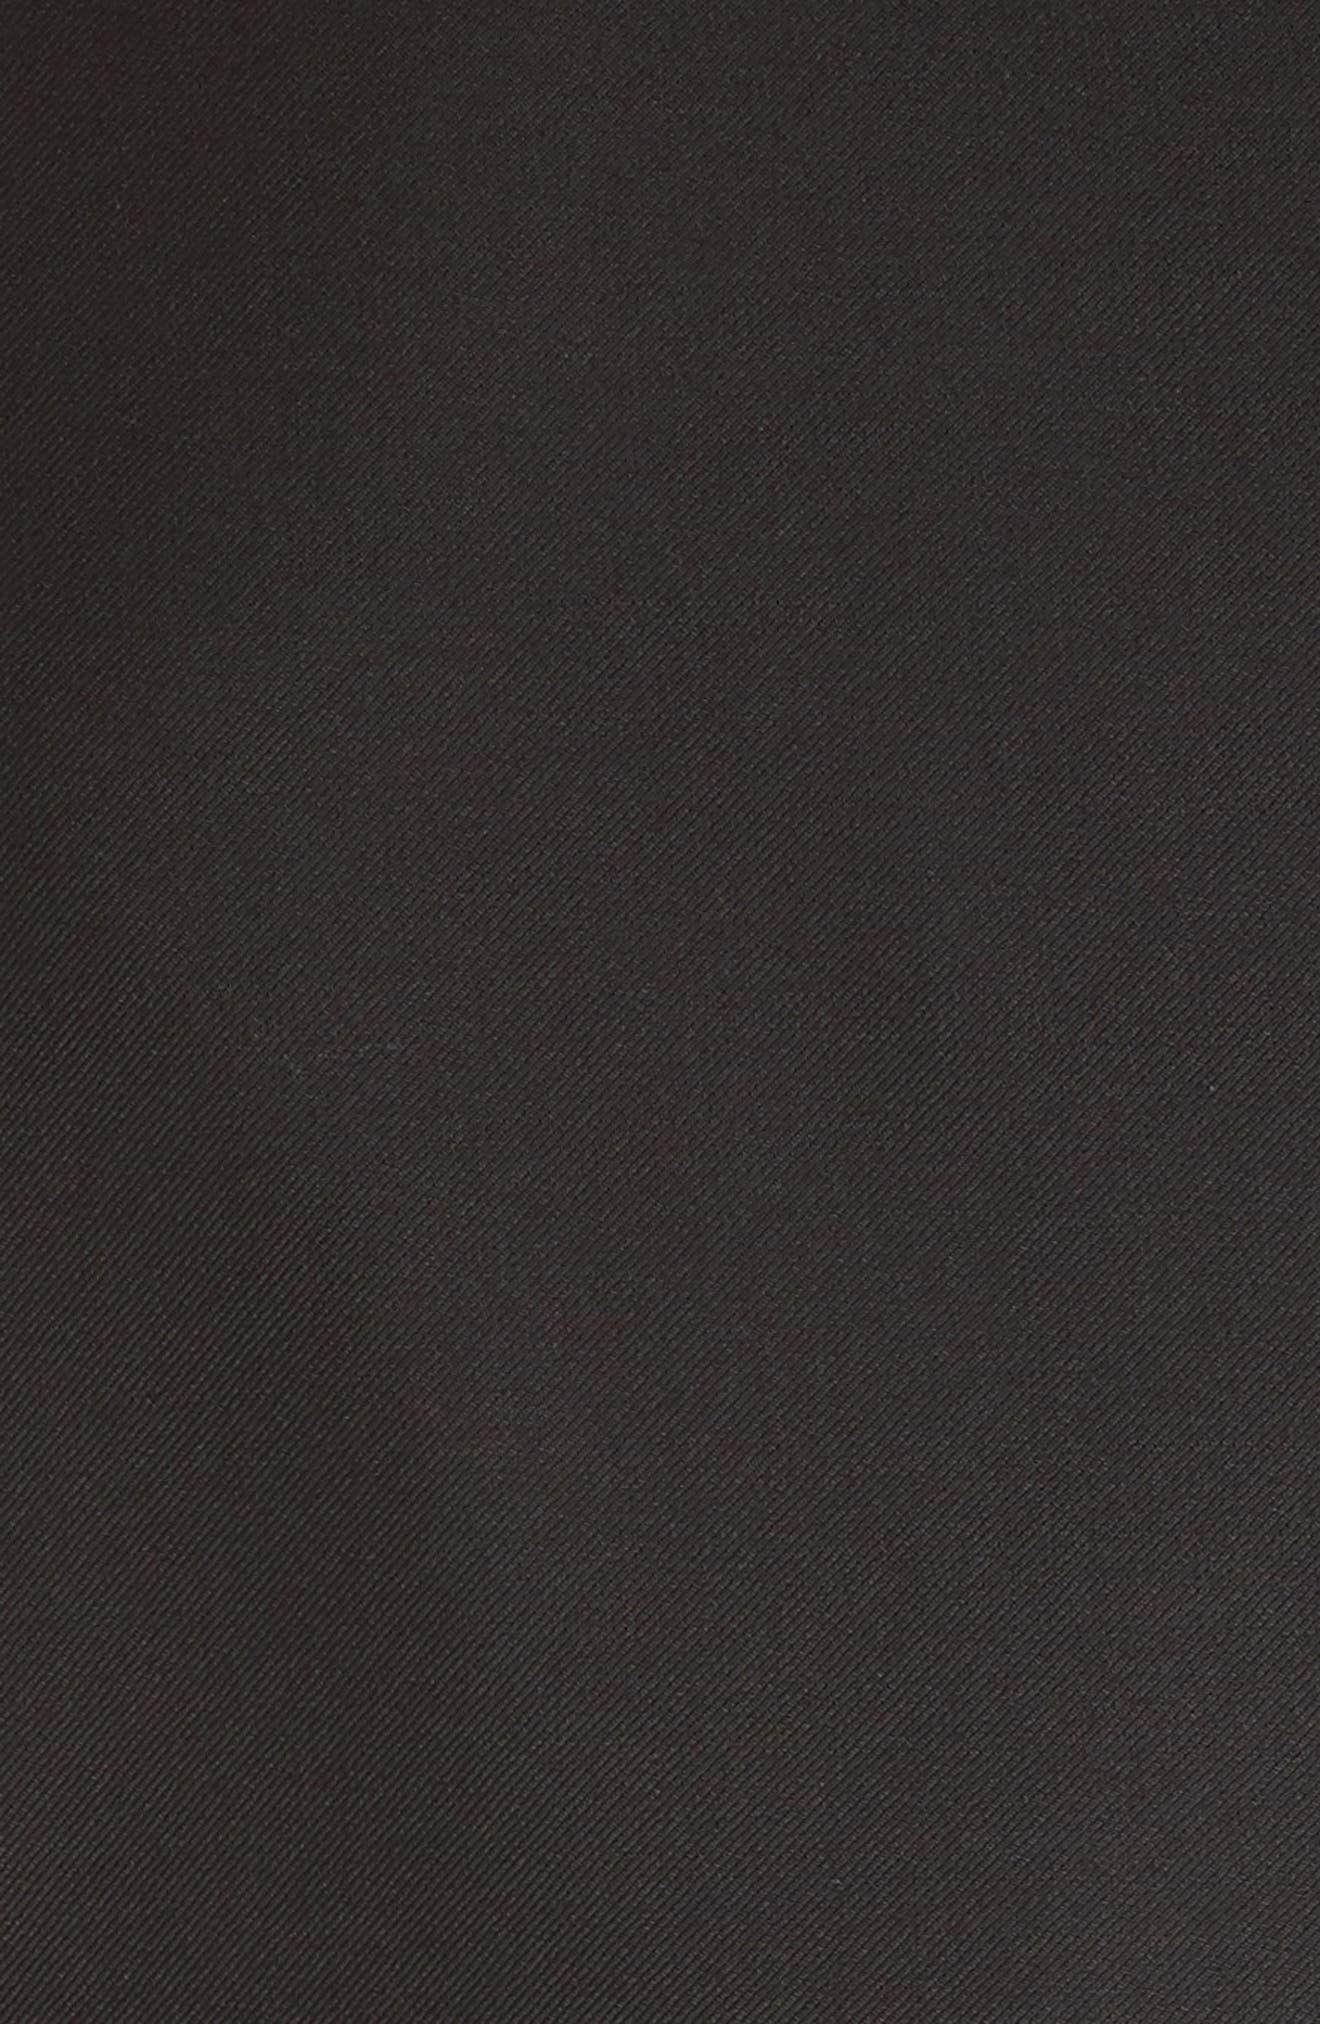 EMPORIO ARMANI, Trim Fit Solid Wool Suit, Alternate thumbnail 7, color, BLACK